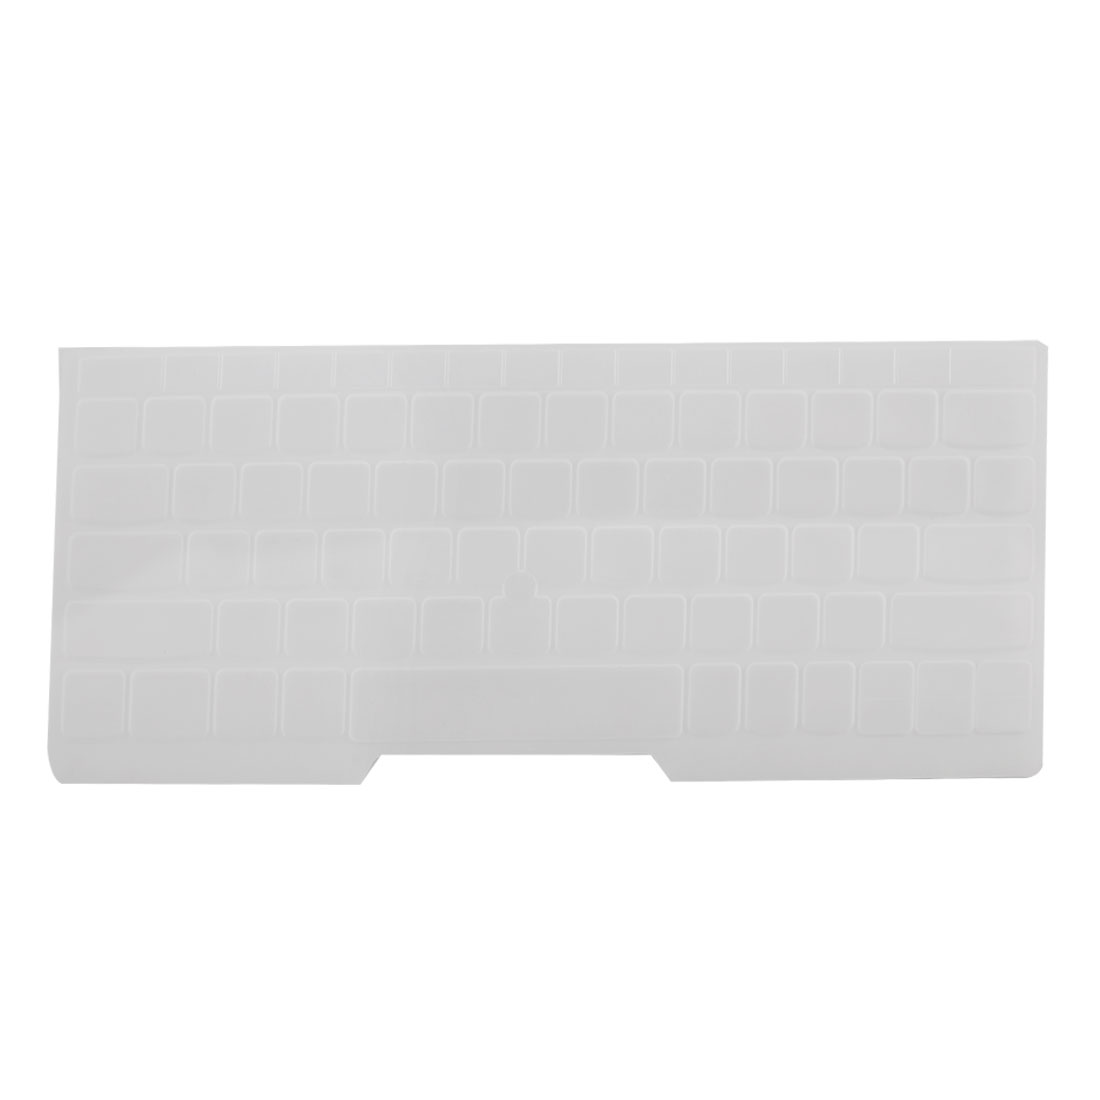 Clear Silicone Keyboard Protective Cover Film for Lenovo Thinkpad E125 E220S